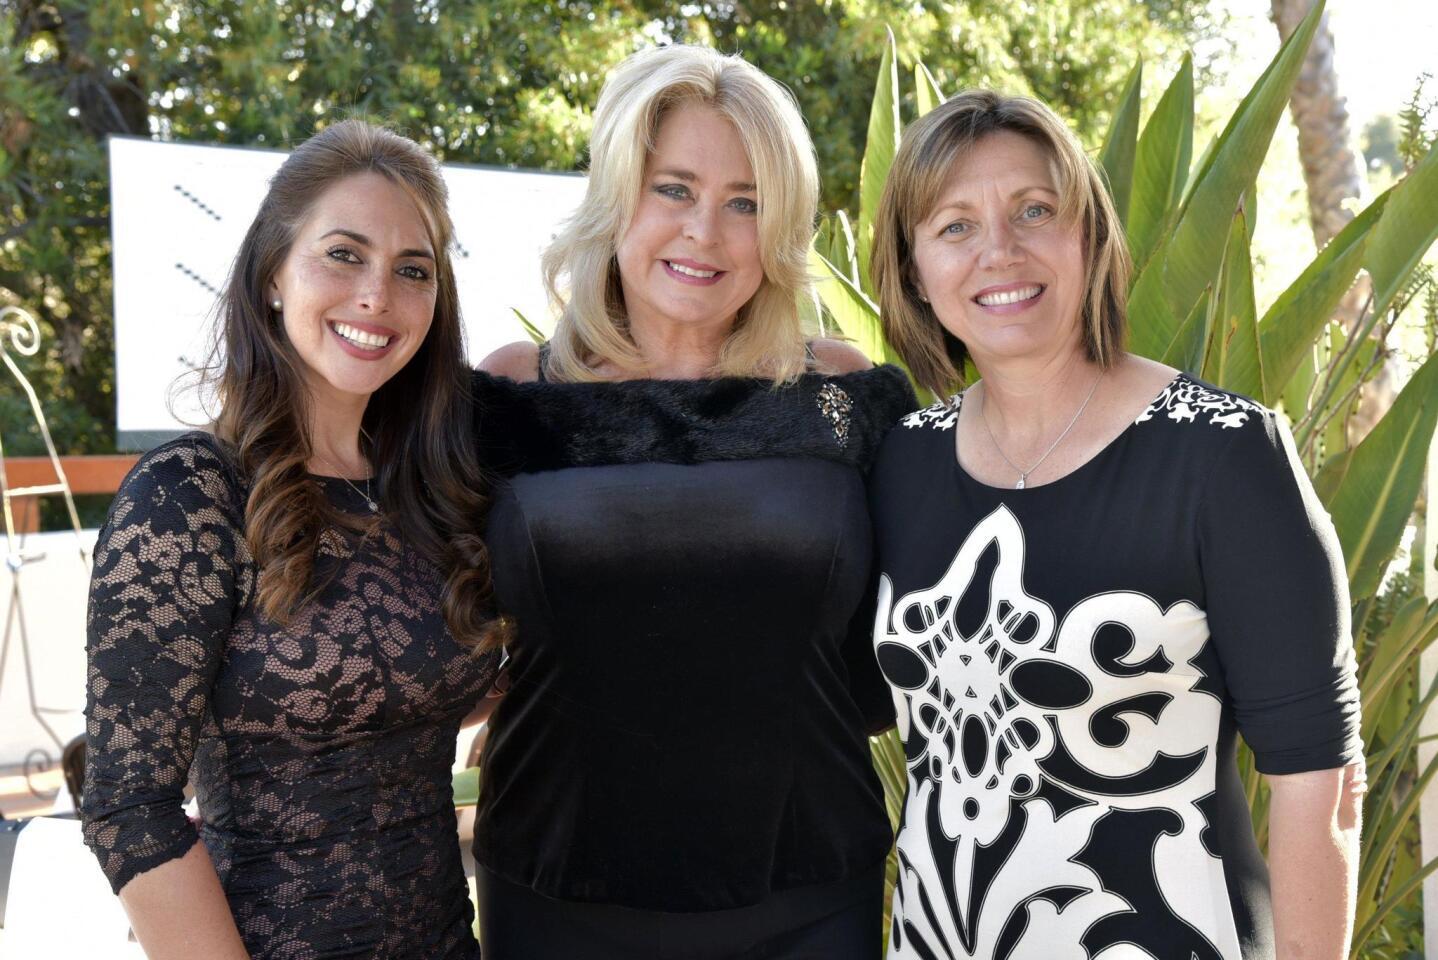 Laura MacKinnon, Carrie Woodland, Paulette Britton